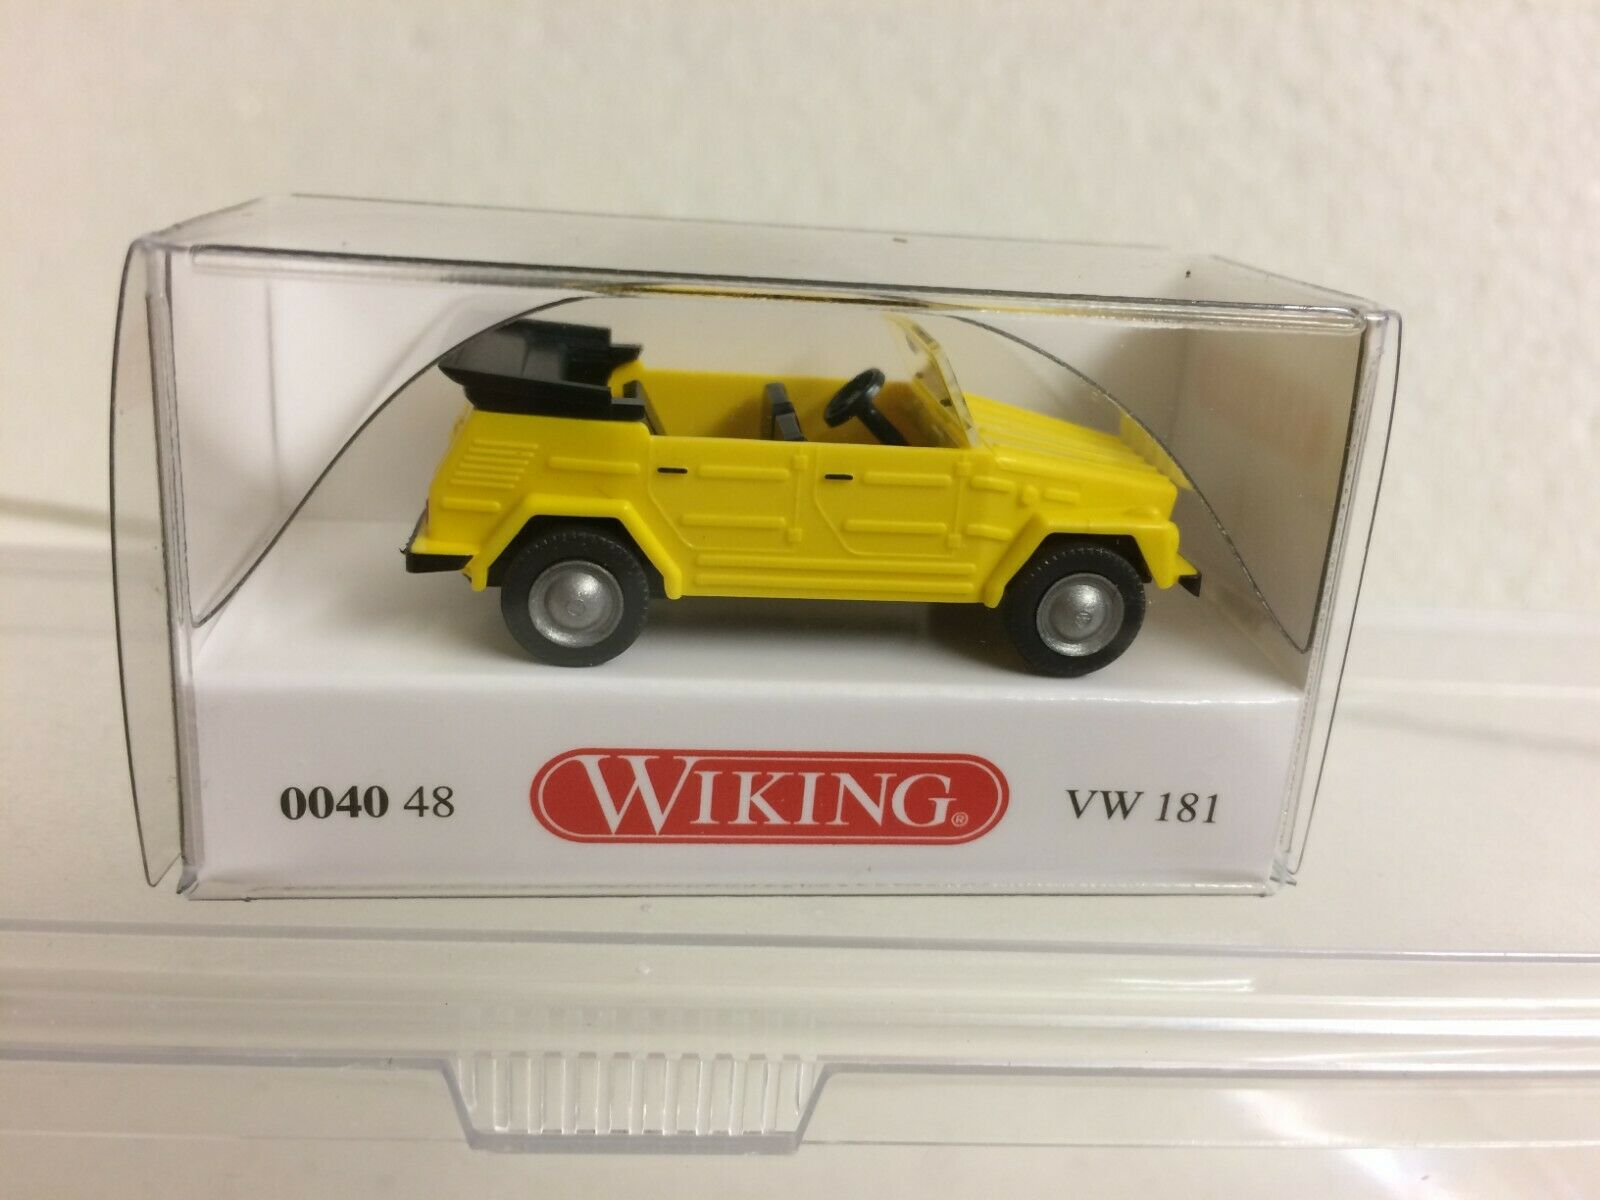 rapsgelb NEUWARE! WIKING 004048//0040 48 H0, 1:87 - VW 181